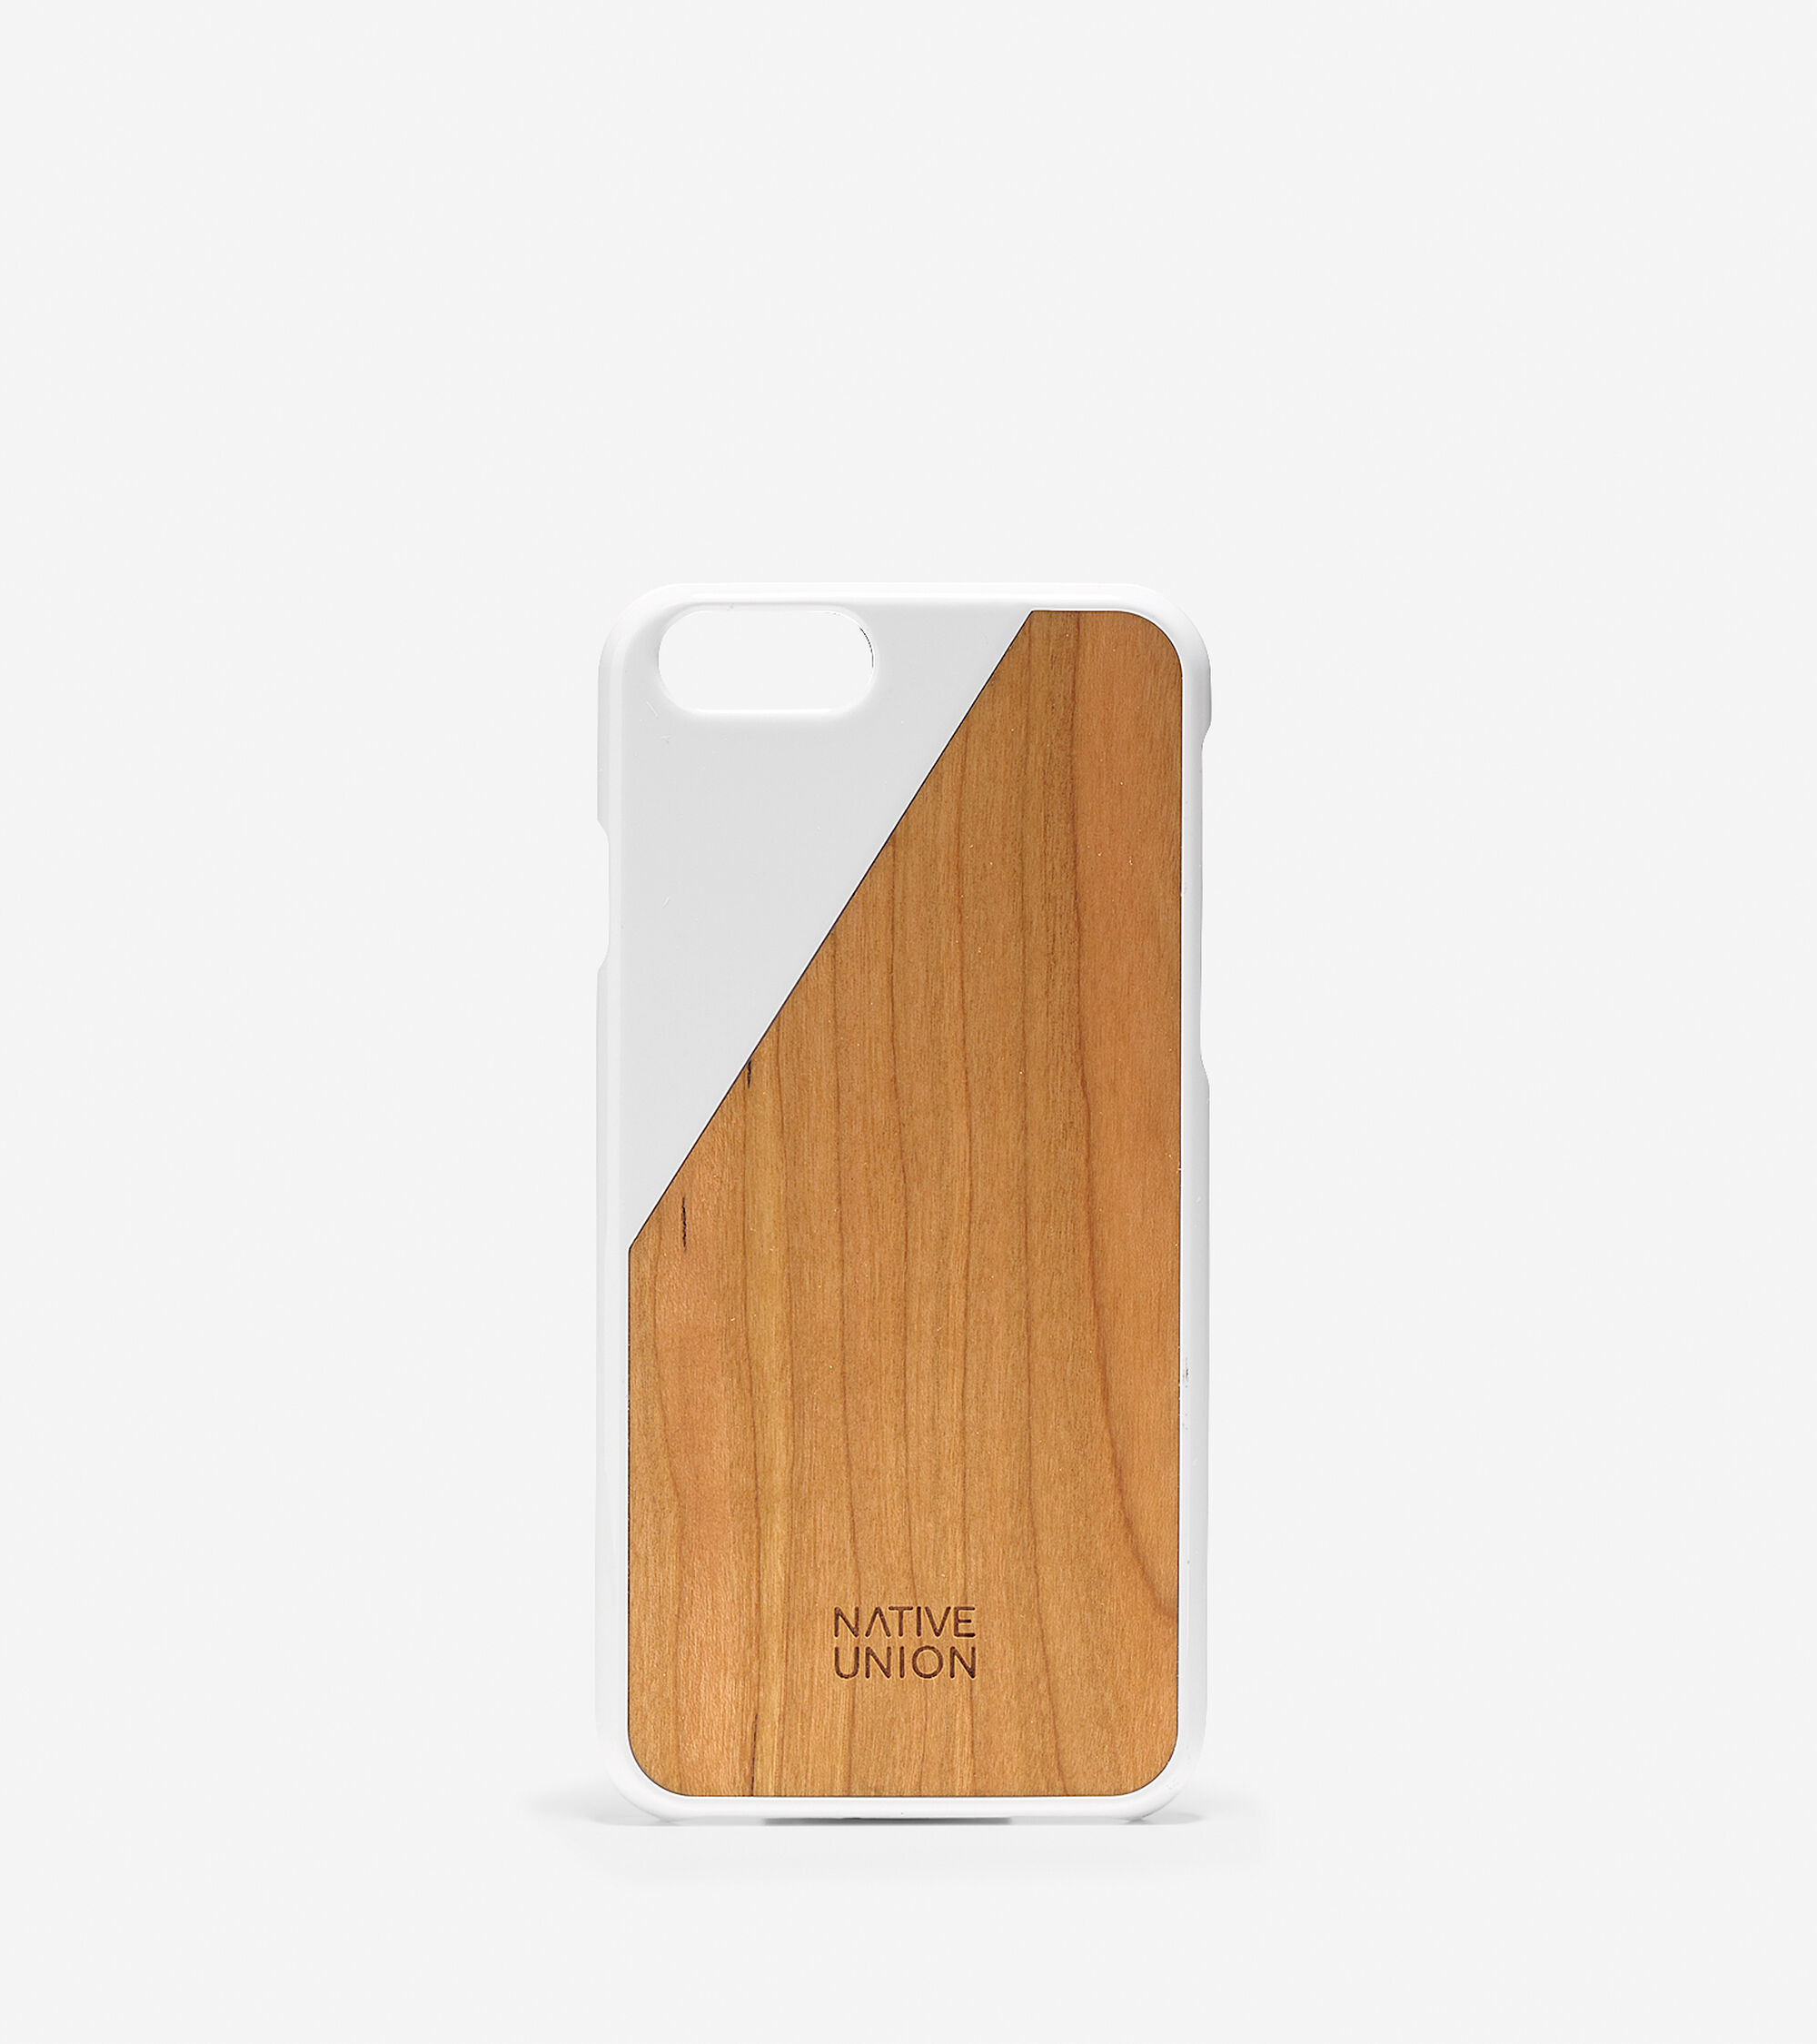 Accessories > Native Union - iPhone 6 Case